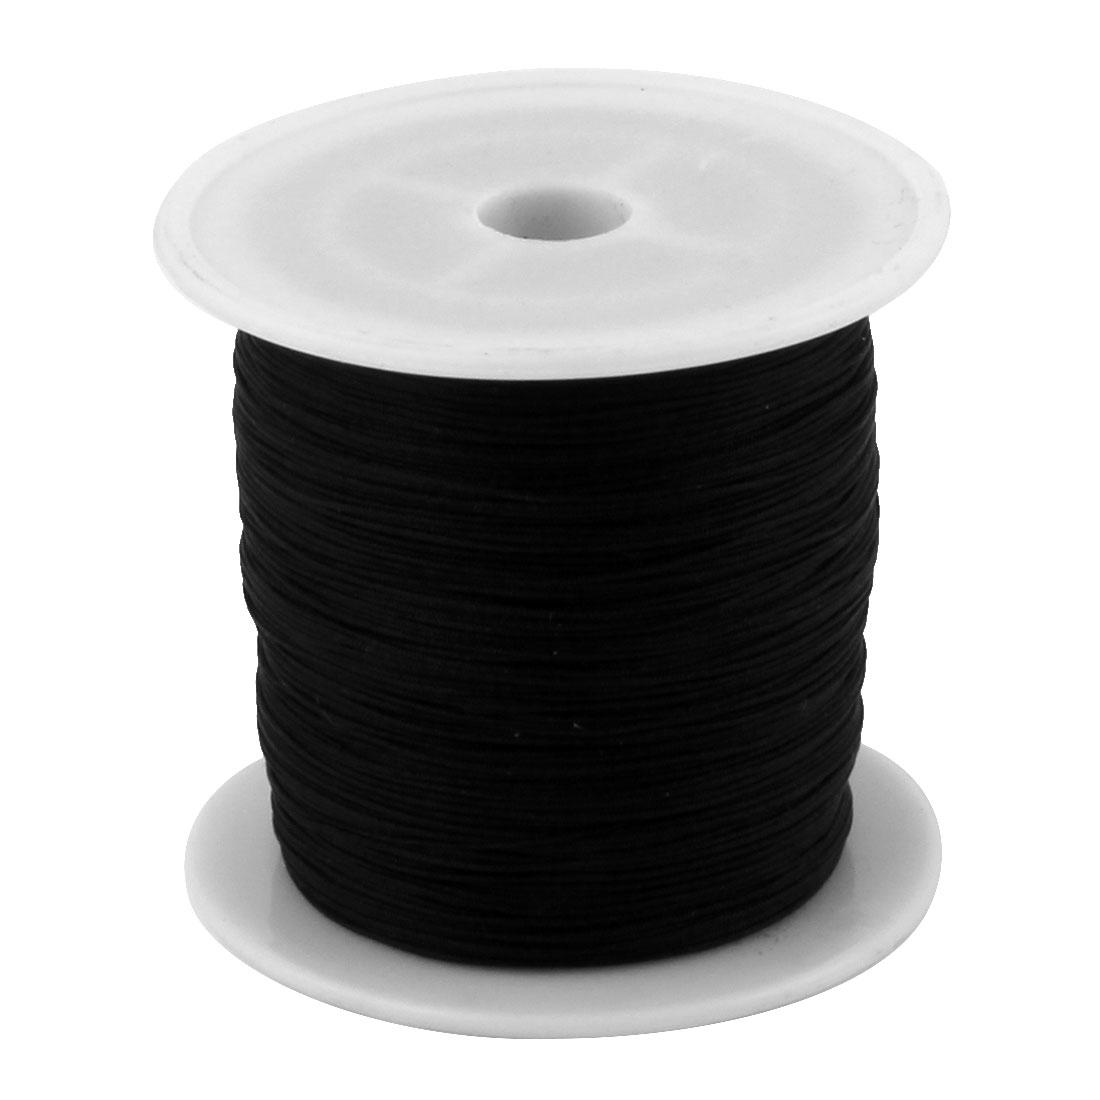 Home Nylon DIY Art Craft Braided Chinese Knot Cord String Rope Black 153 Yards